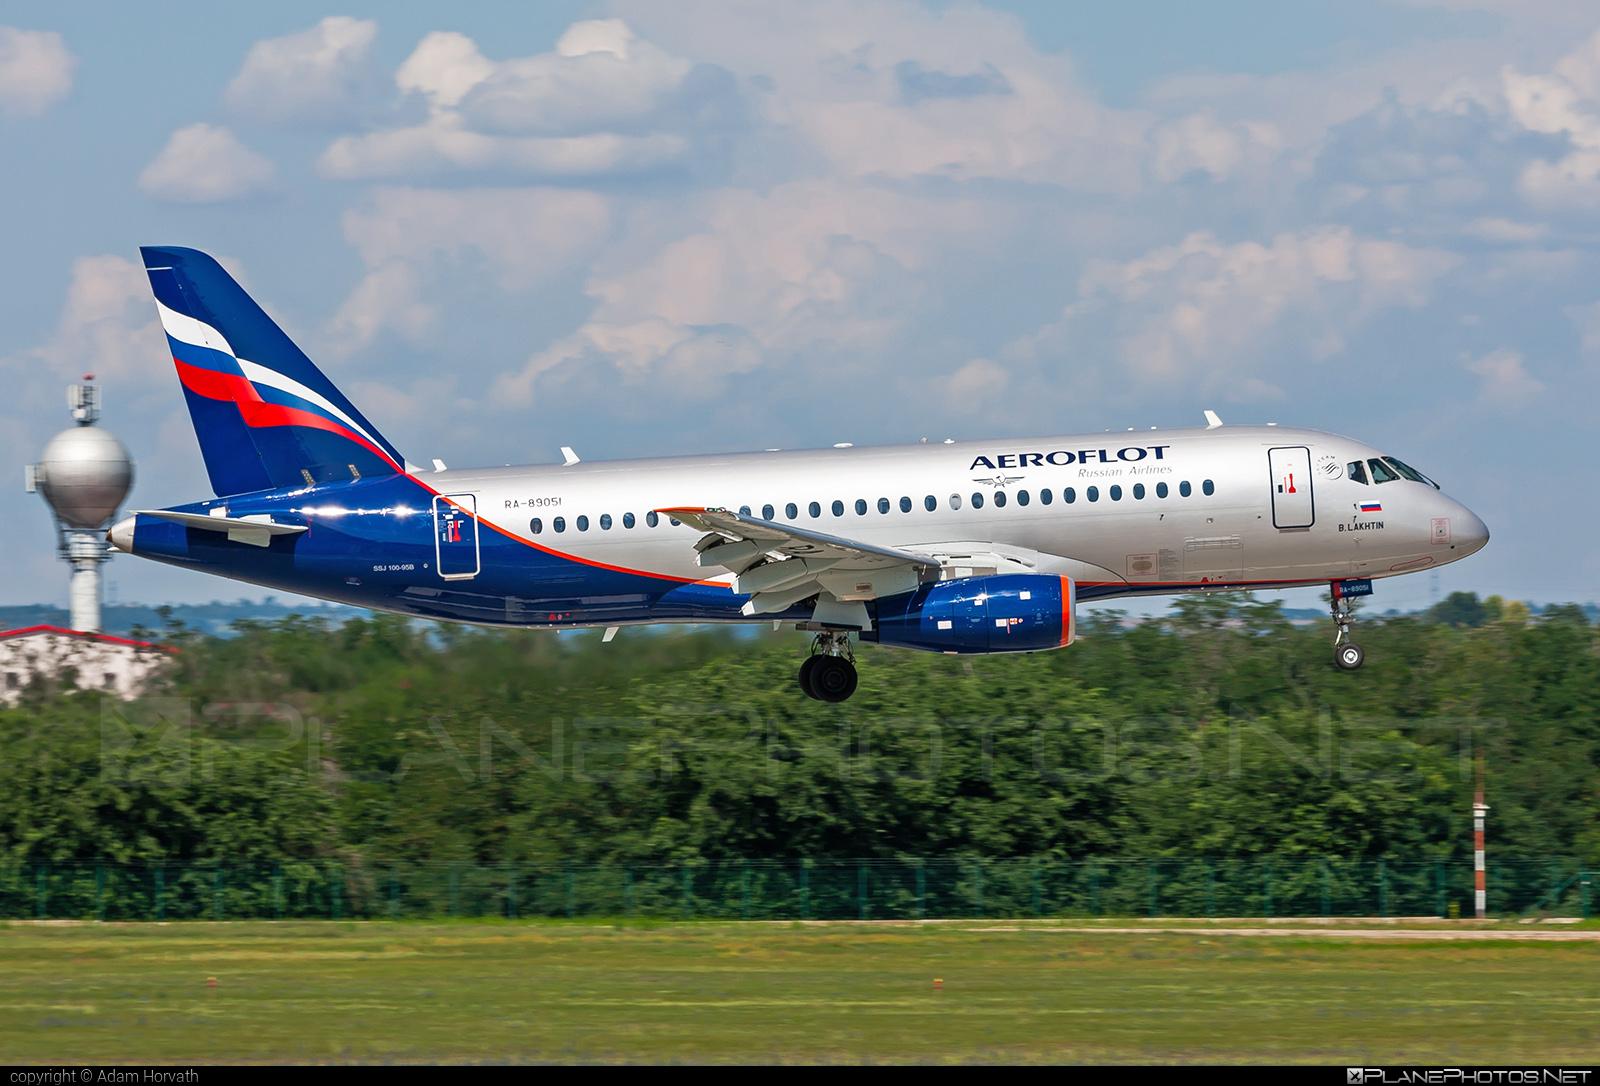 Sukhoi SSJ 100-95B Superjet - RA-89051 operated by Aeroflot #aeroflot #ssj100 #ssj10095b #sukhoi #sukhoisuperjet #superjet